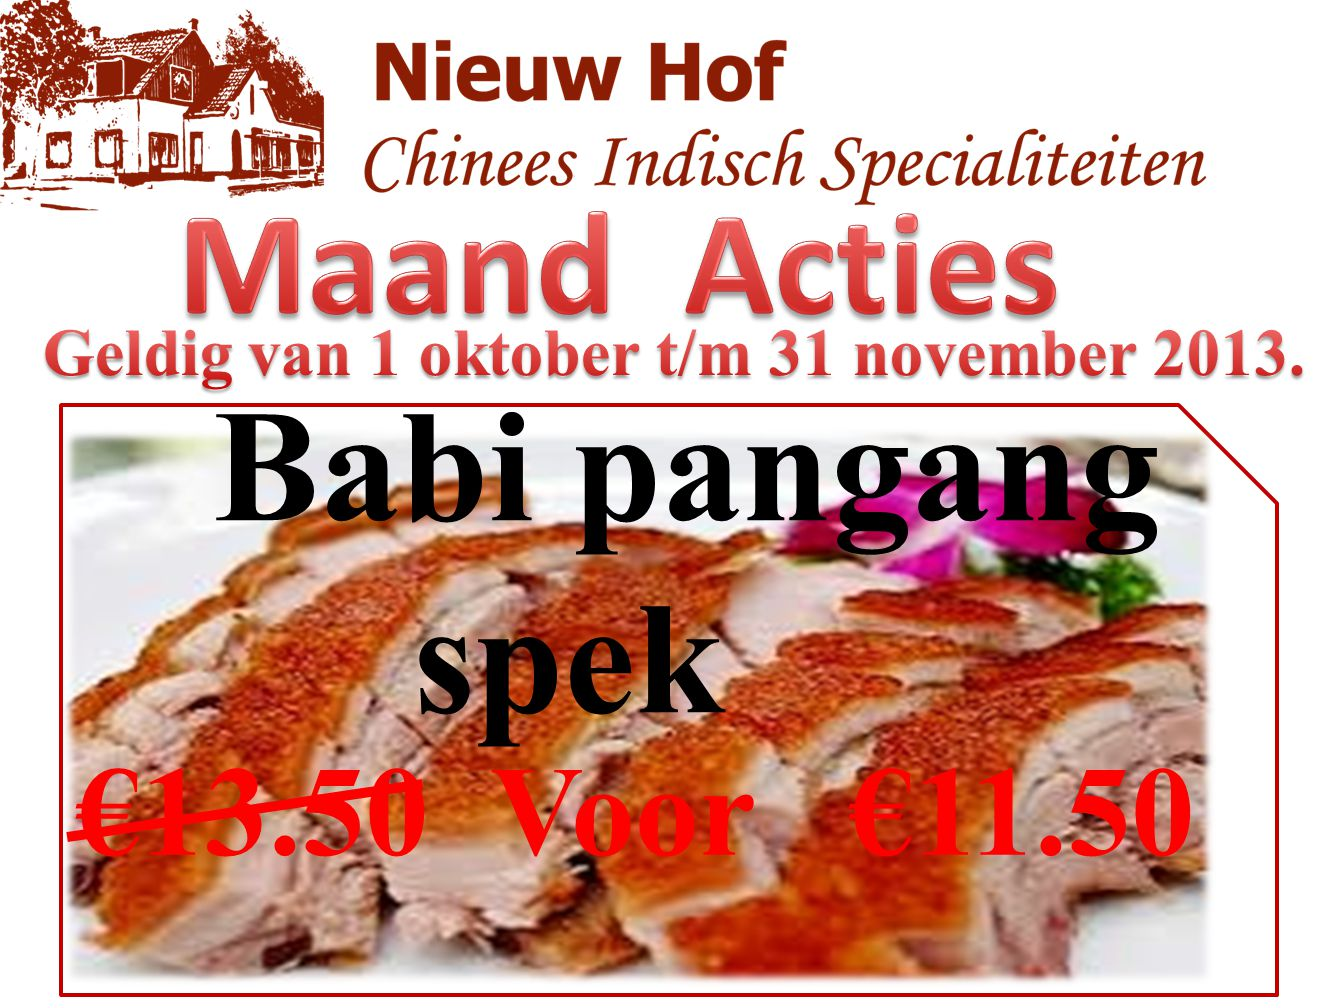 Babi pangang spek €13.50 Voor €11.50